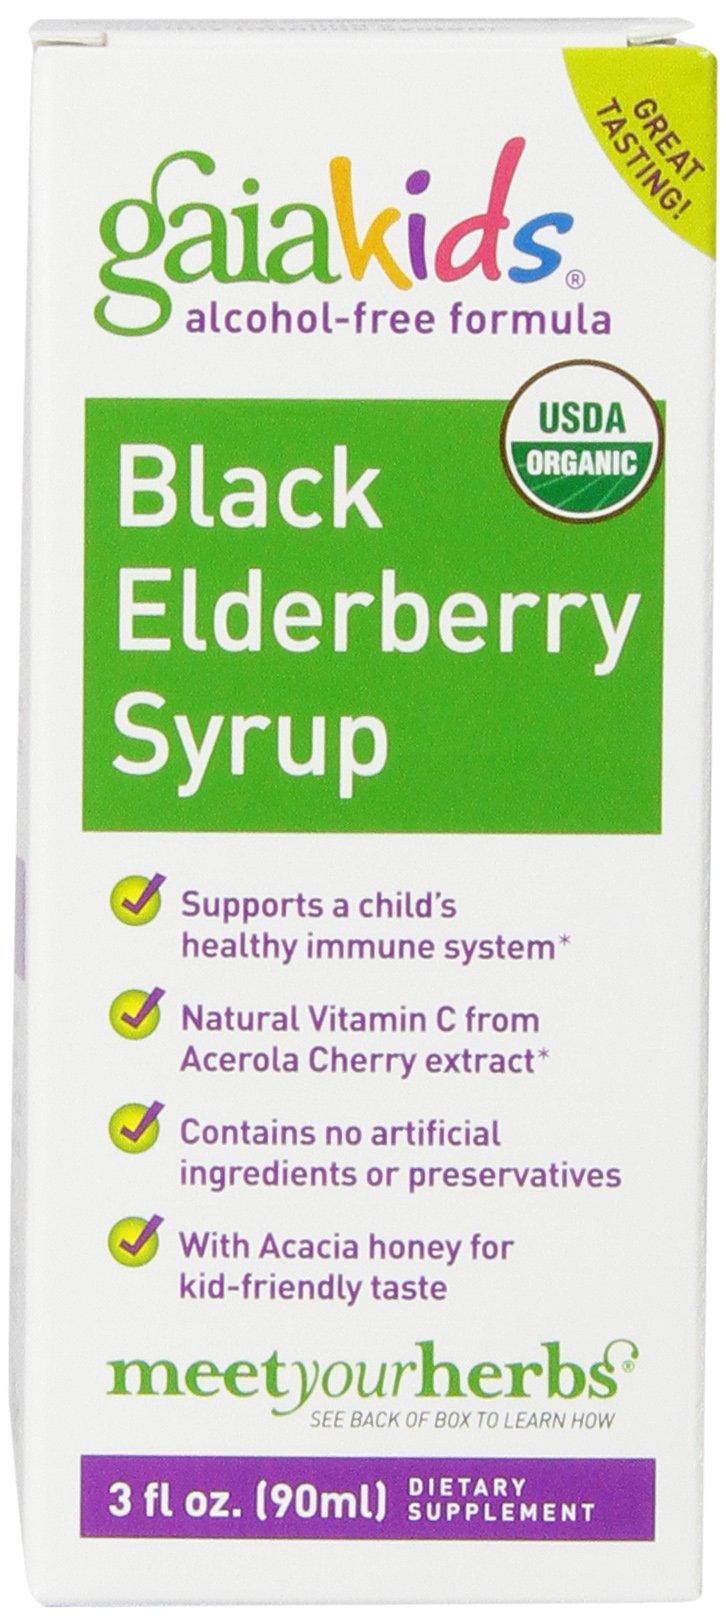 Gaia Kids Black Elderberry Syrup, 3-Ounce Bottle